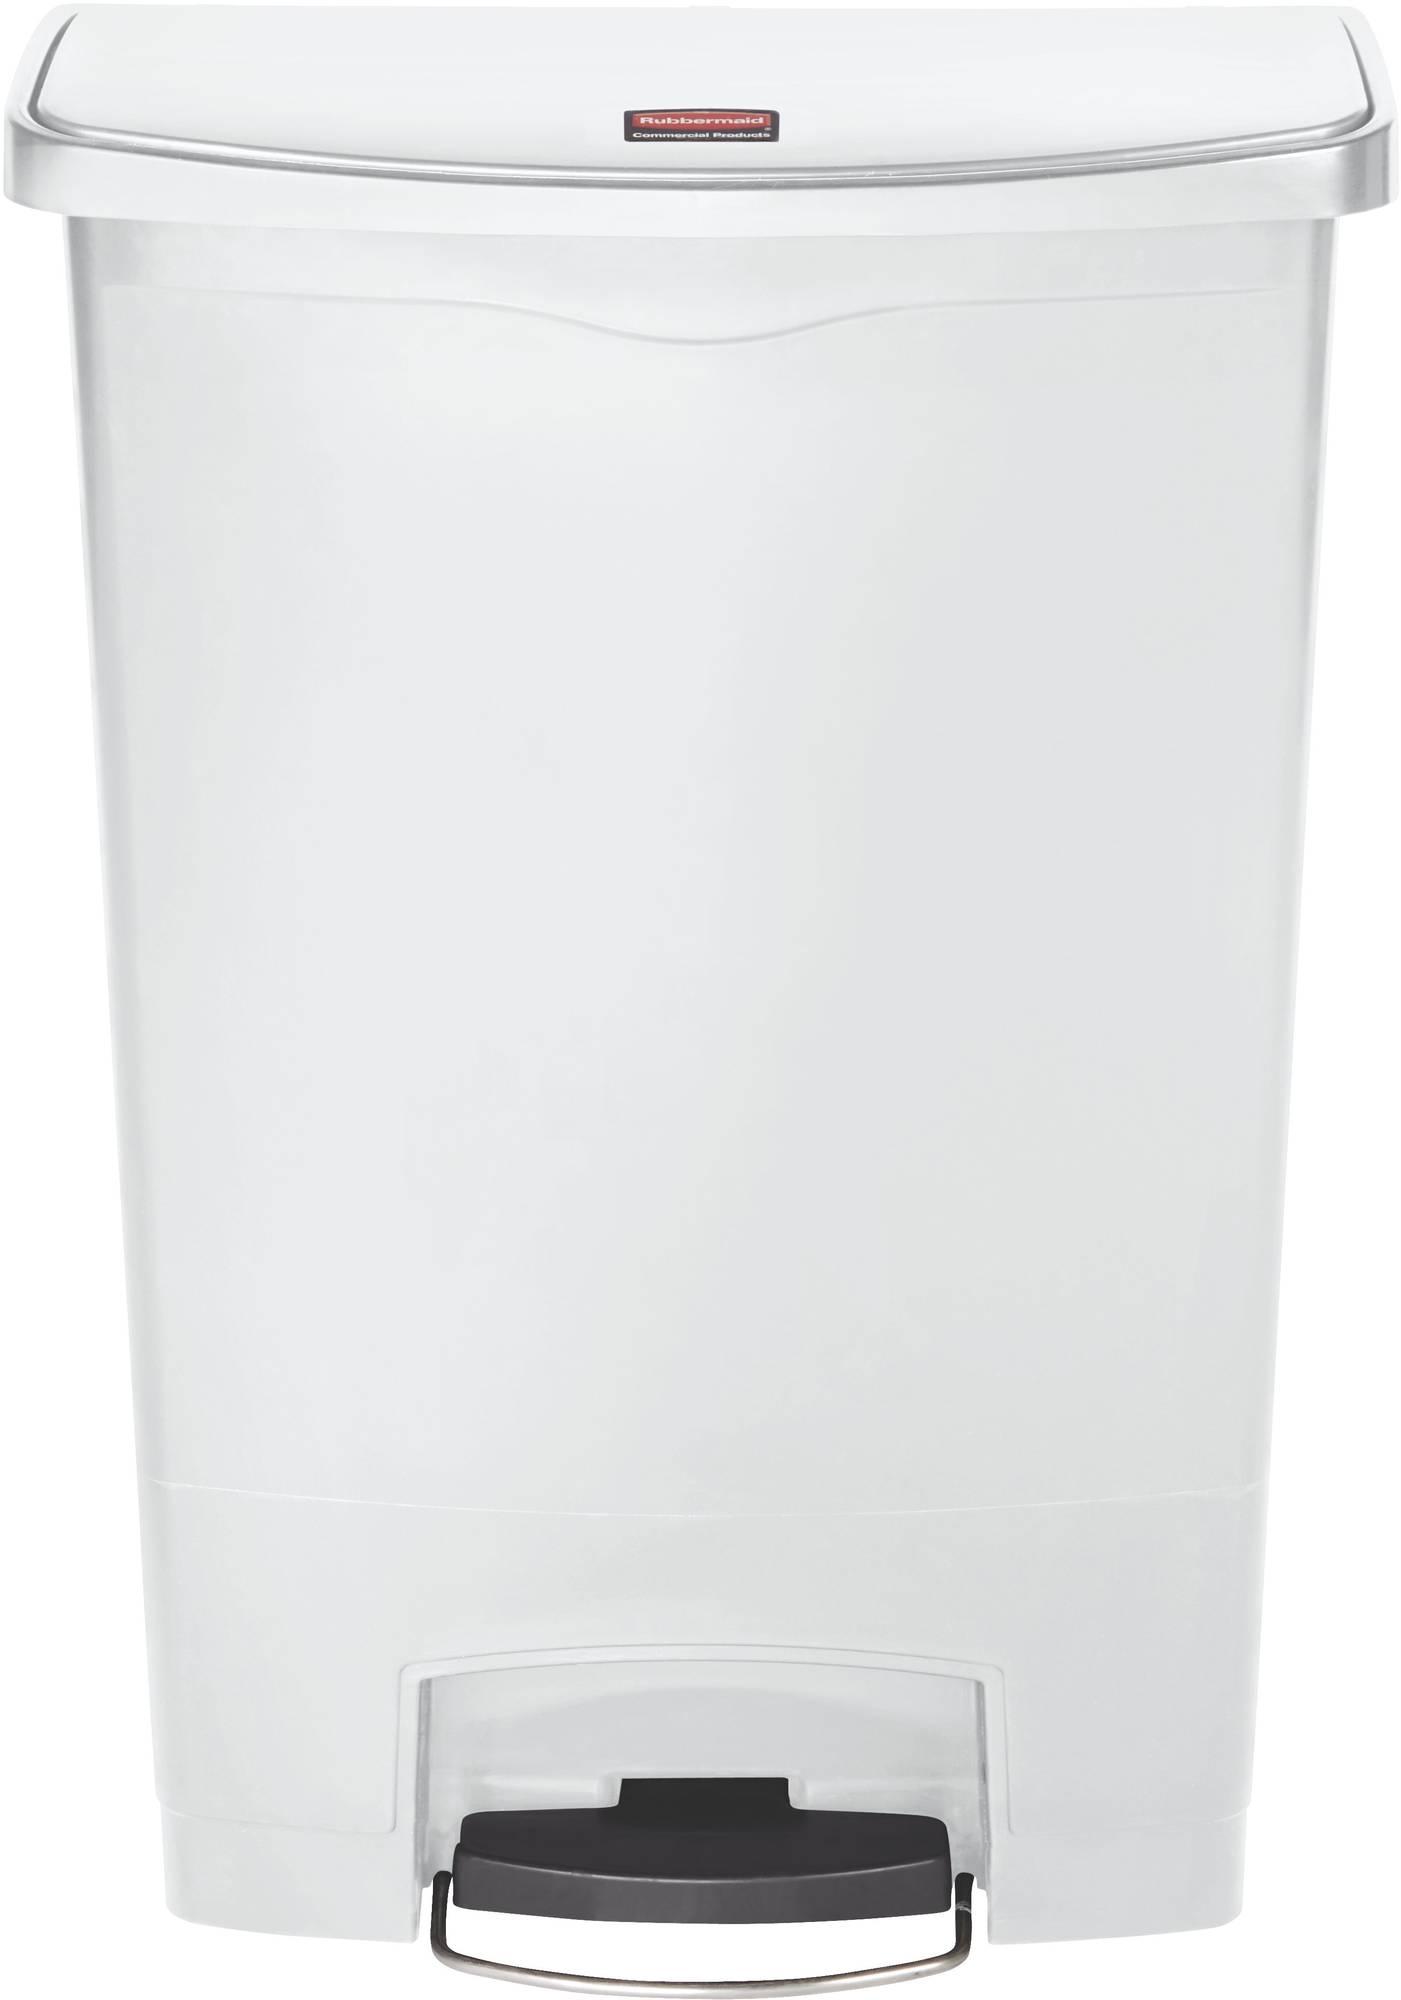 Rubbermaid Slim Jim Step On Container, Front Step mit 90 l Füllmenge in Weiß, breites Fußpedal